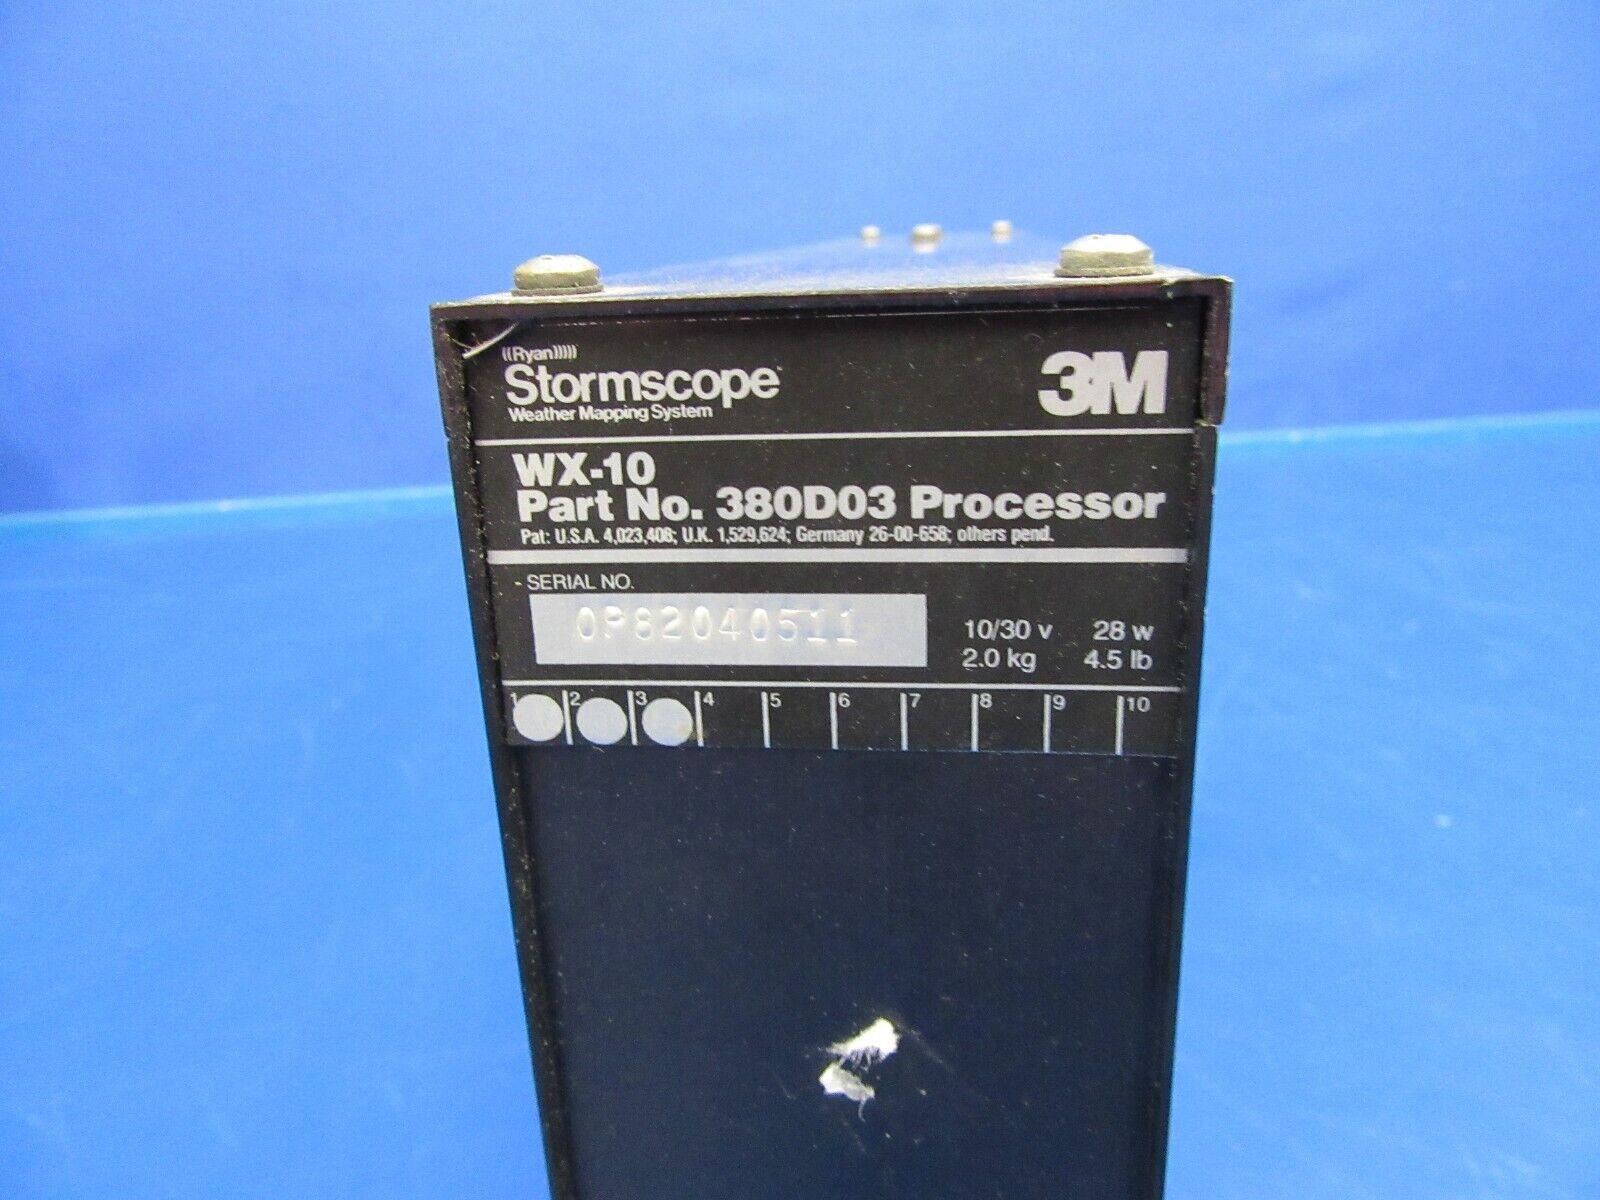 3M Stormscope WX-10 Processor P/N 380D03 (0419-346)